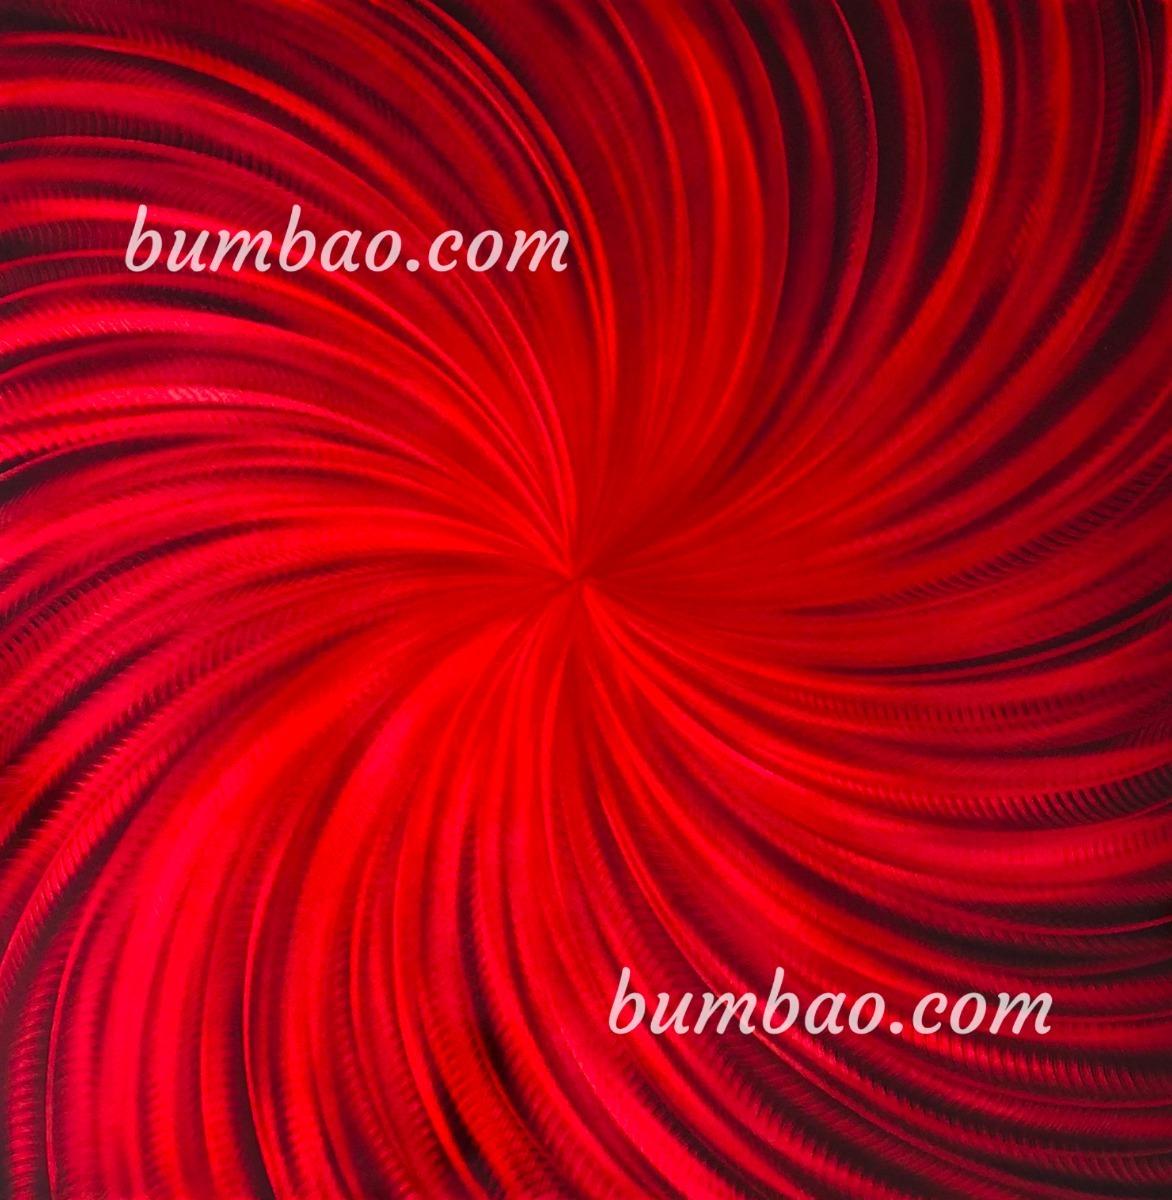 Cuadro Rojo Moderno Cuadro En Metal Tonos Rojos -   4 a5f95545f6a0